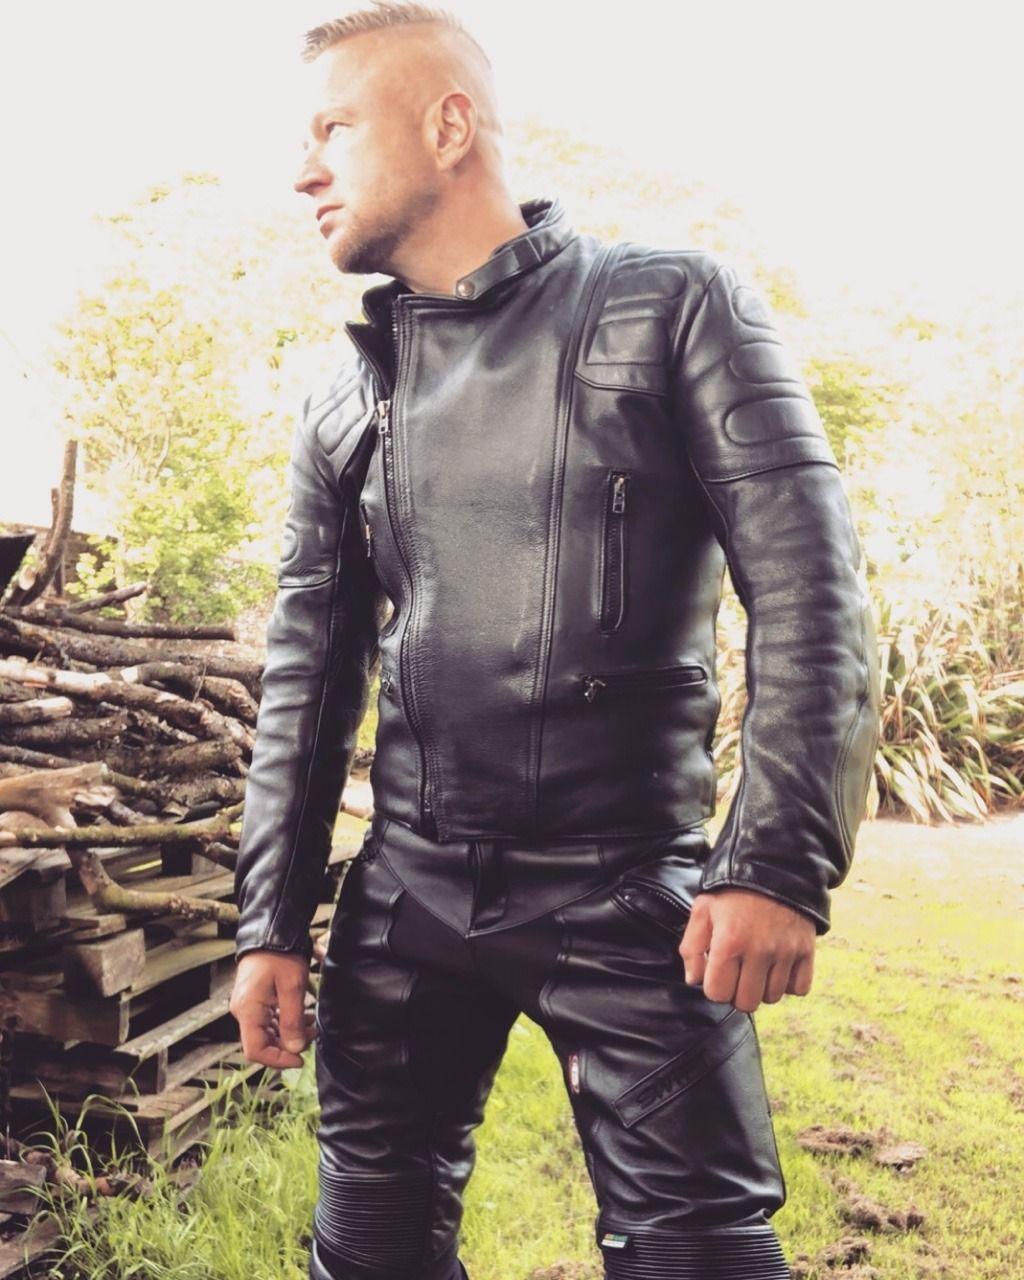 15f11e9d1 3) Tumblr   LeatherMen LeatherGear   Motorbike leathers, Bike ...